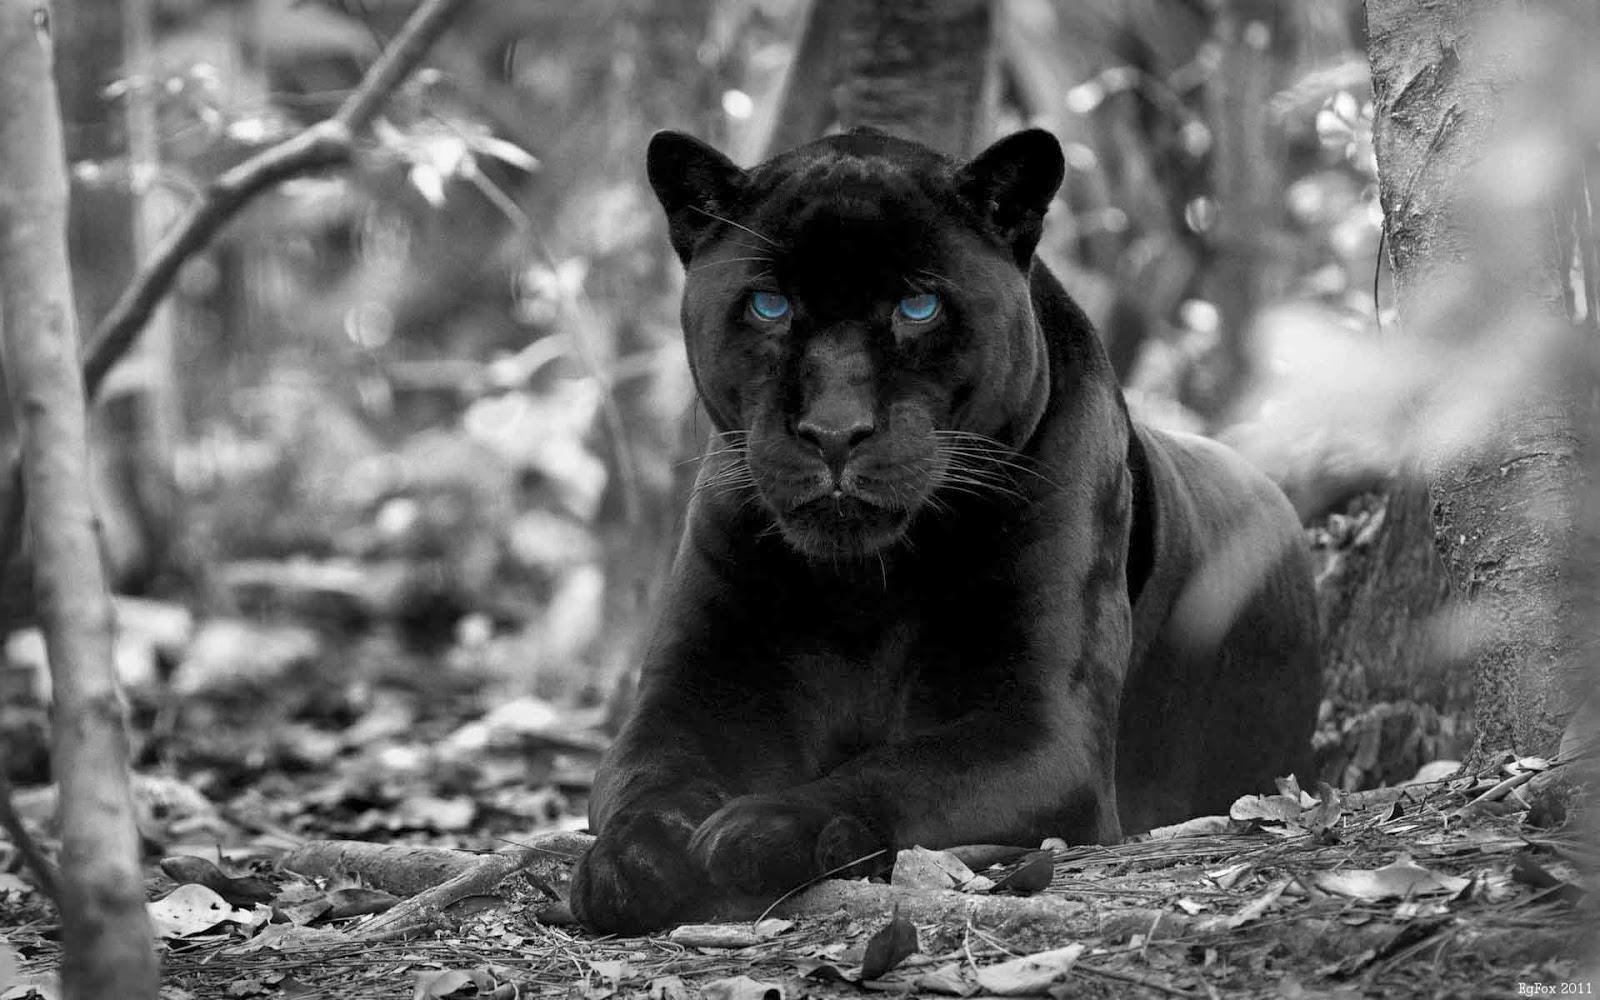 Black Panther Animal Wallpapers: Desktop HD Wallpapers Free Downloads: Angry Black Panther